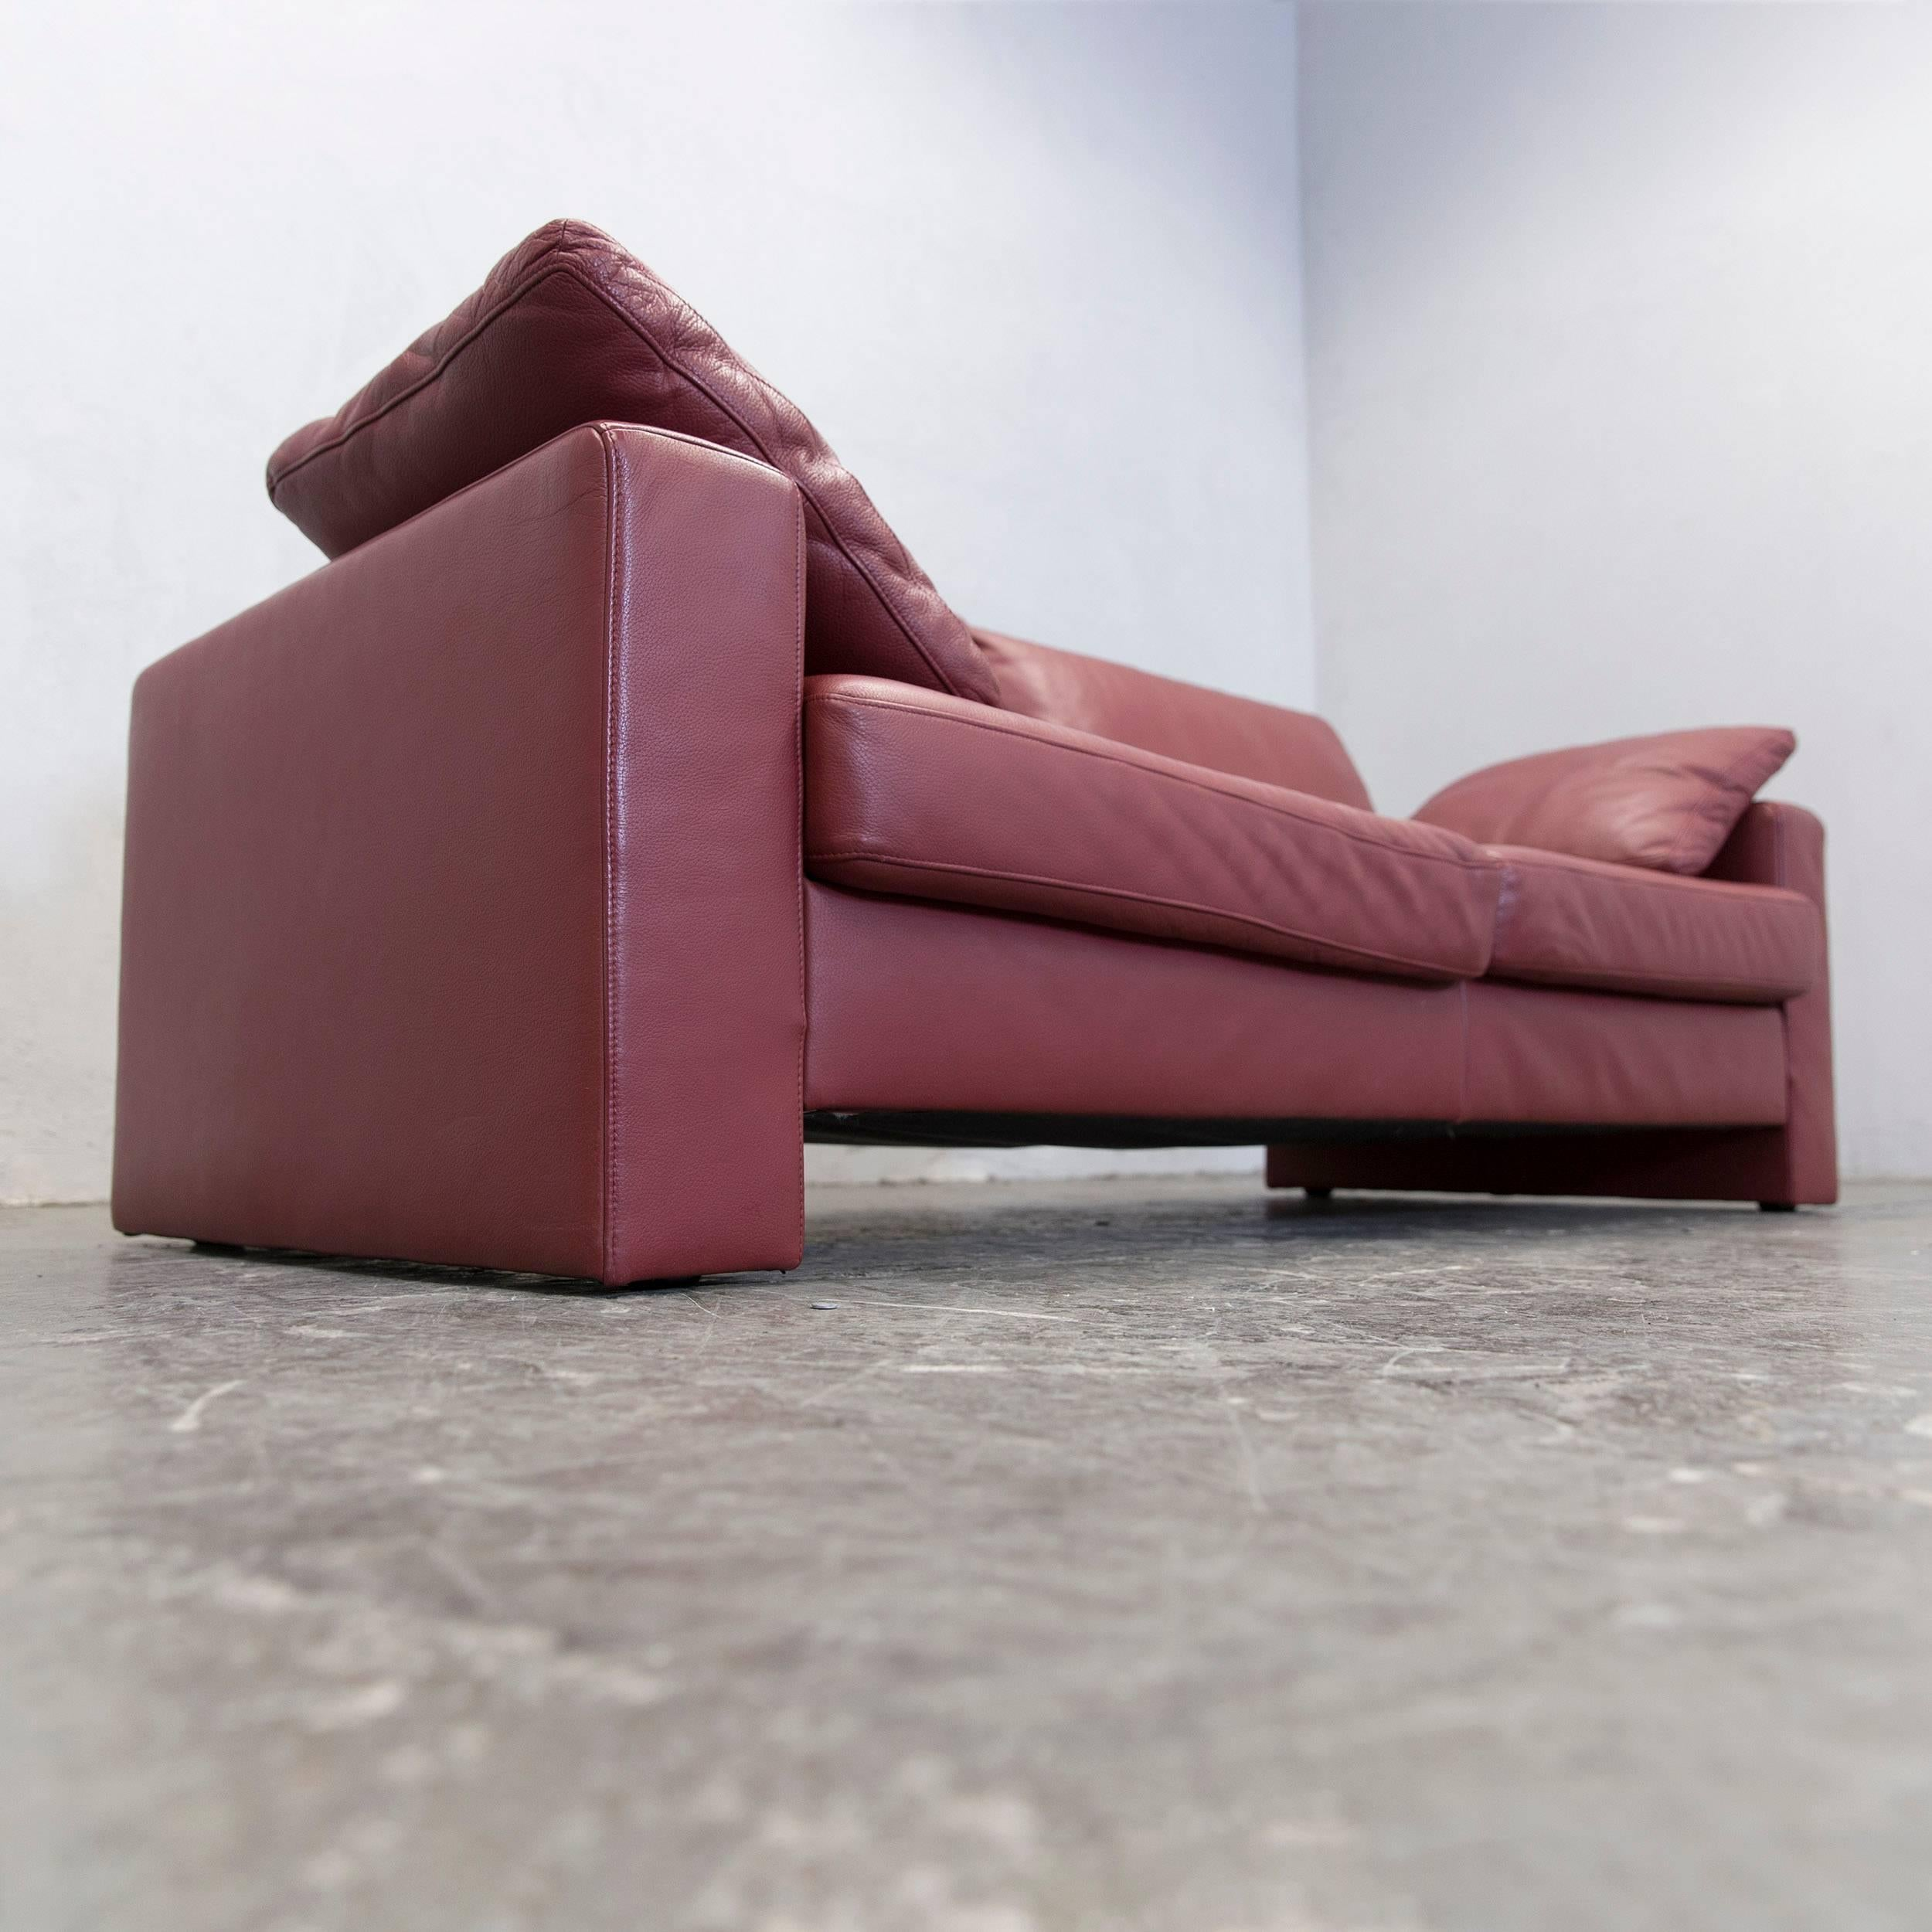 designer ledercouch beautiful designer couch modena l. Black Bedroom Furniture Sets. Home Design Ideas